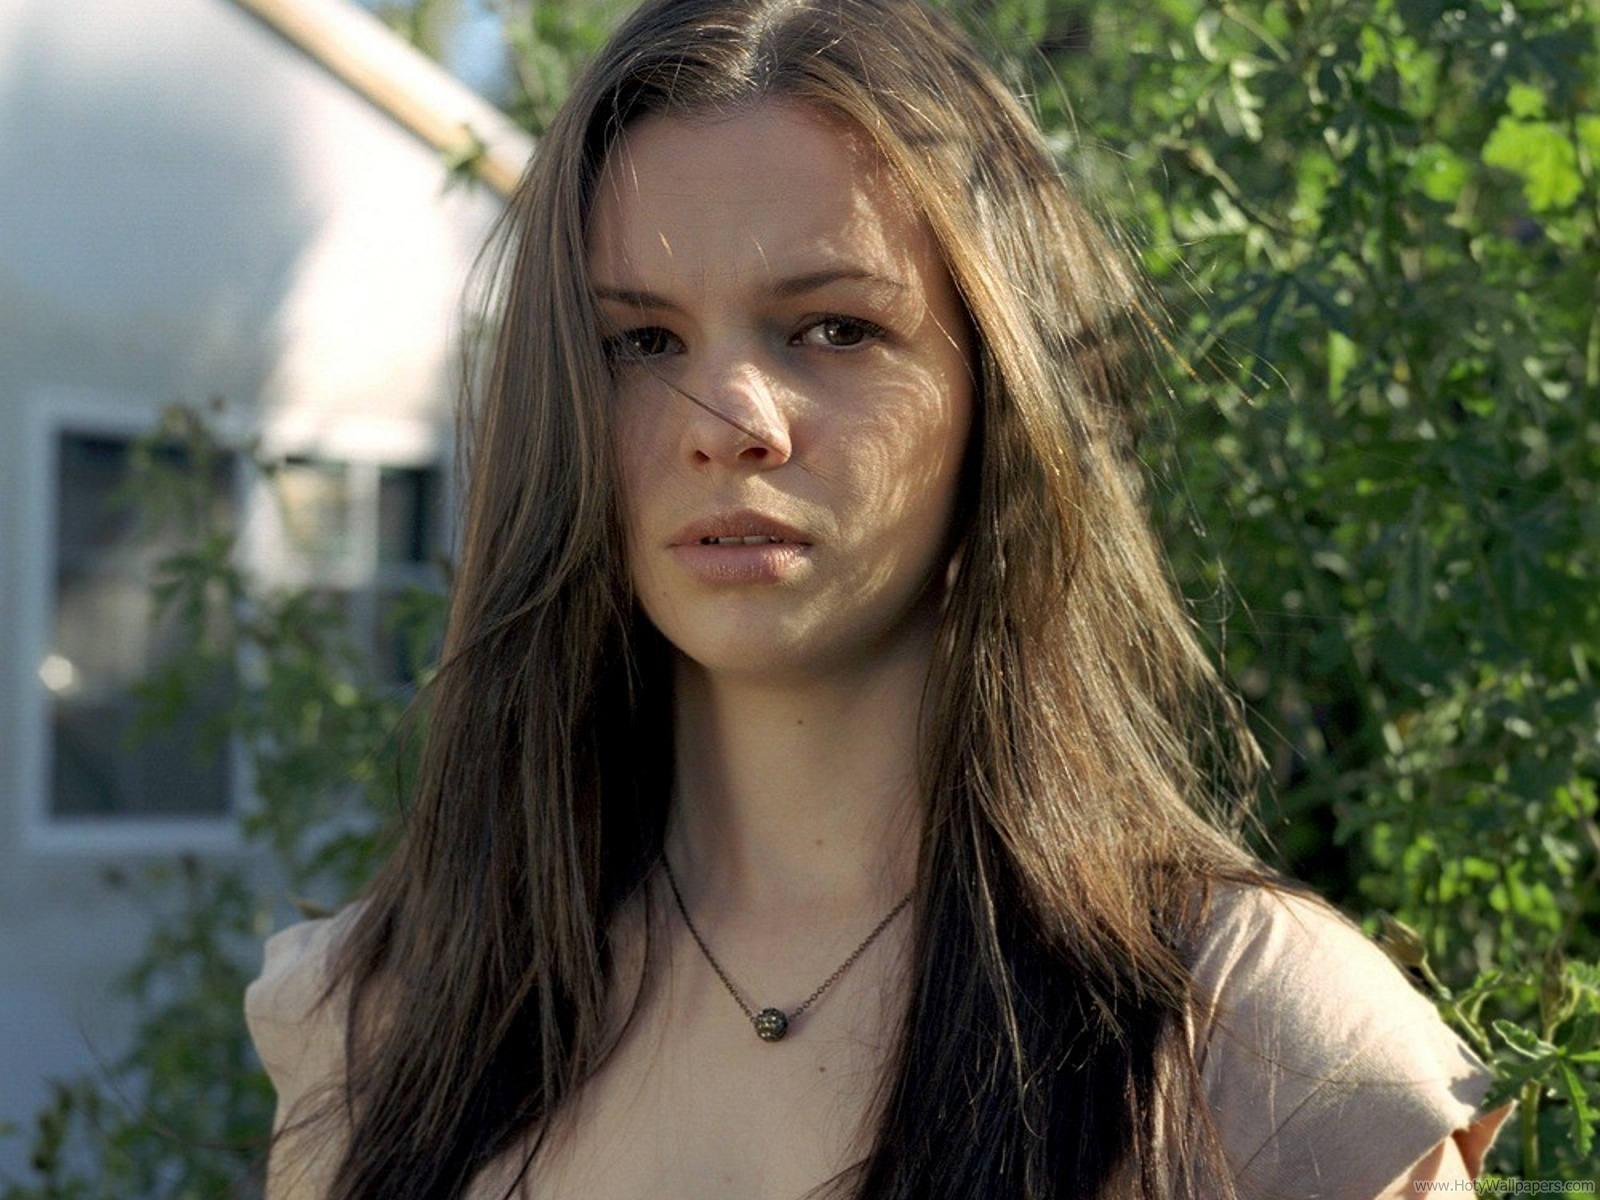 http://1.bp.blogspot.com/-f0OI9dFj5is/Tvx9rm_8loI/AAAAAAAABnk/QWR0DFKNZYI/s1600/hollywood_actress_amber_tamblyn_hq_wallpaper-1440x1280-05.jpg